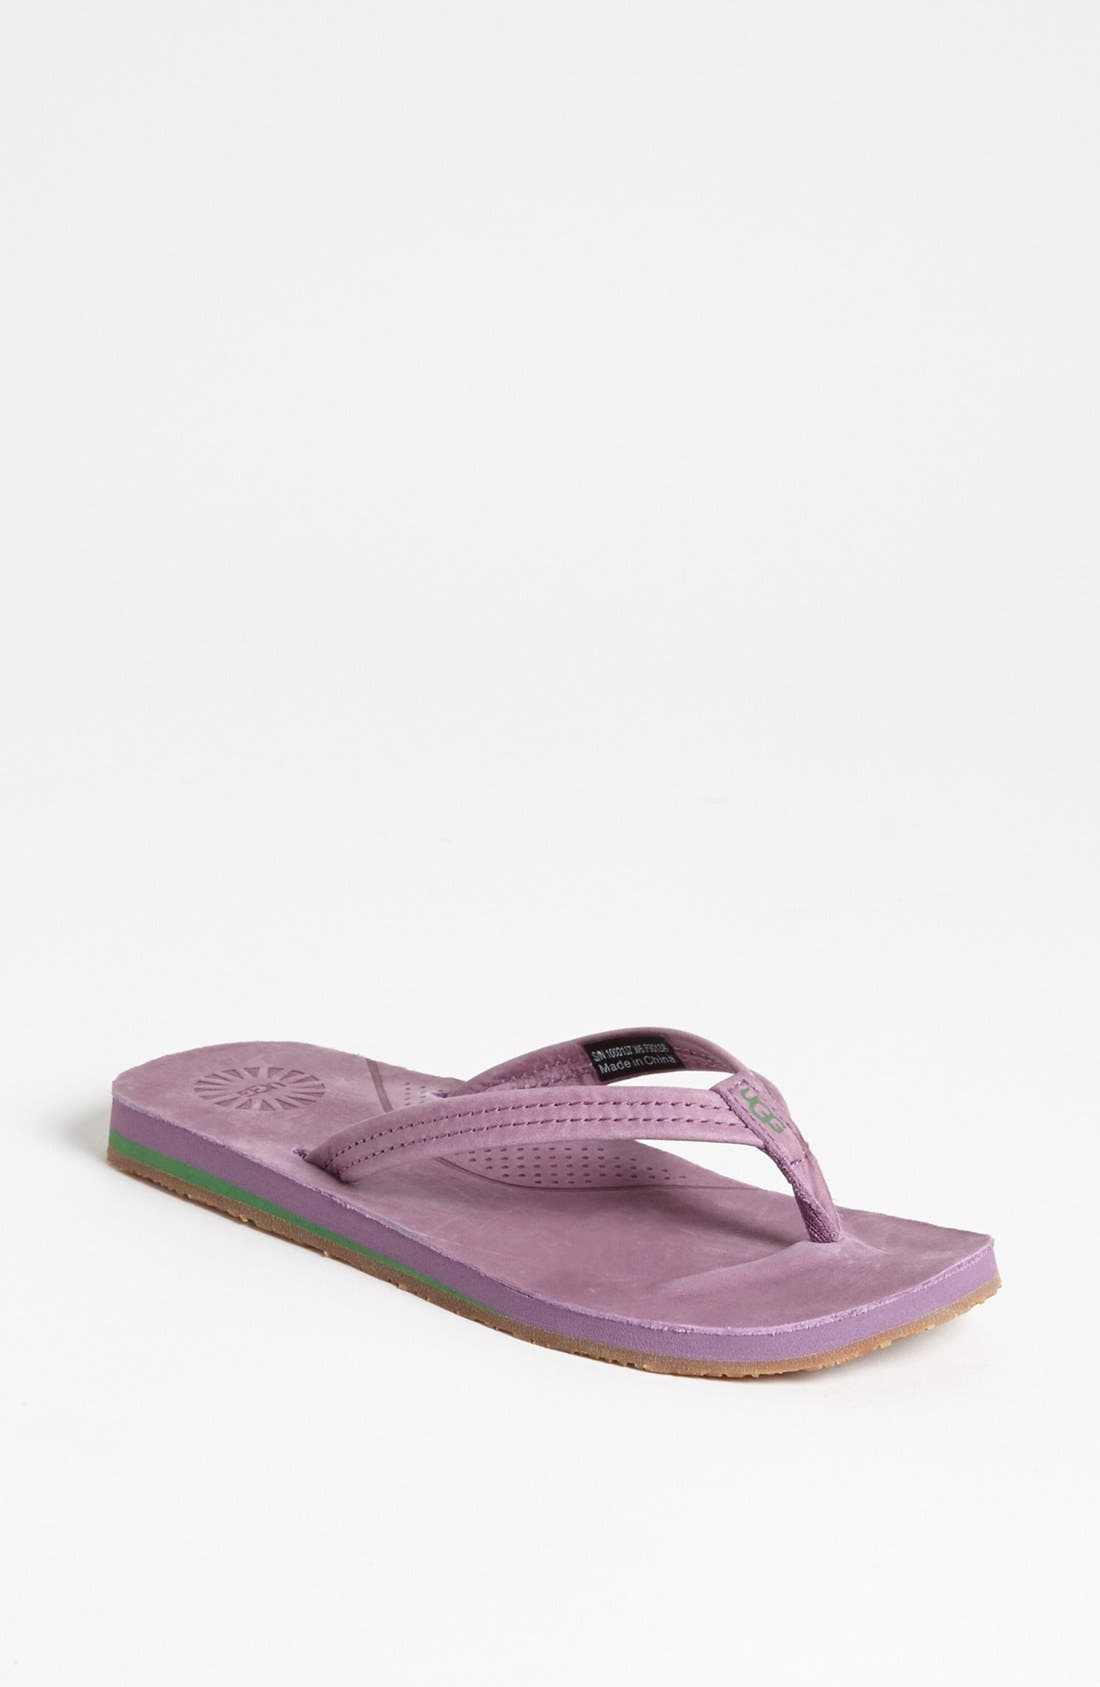 Alternate Image 1 Selected - UGG® 'Kayla' Thong Sandal (Women)